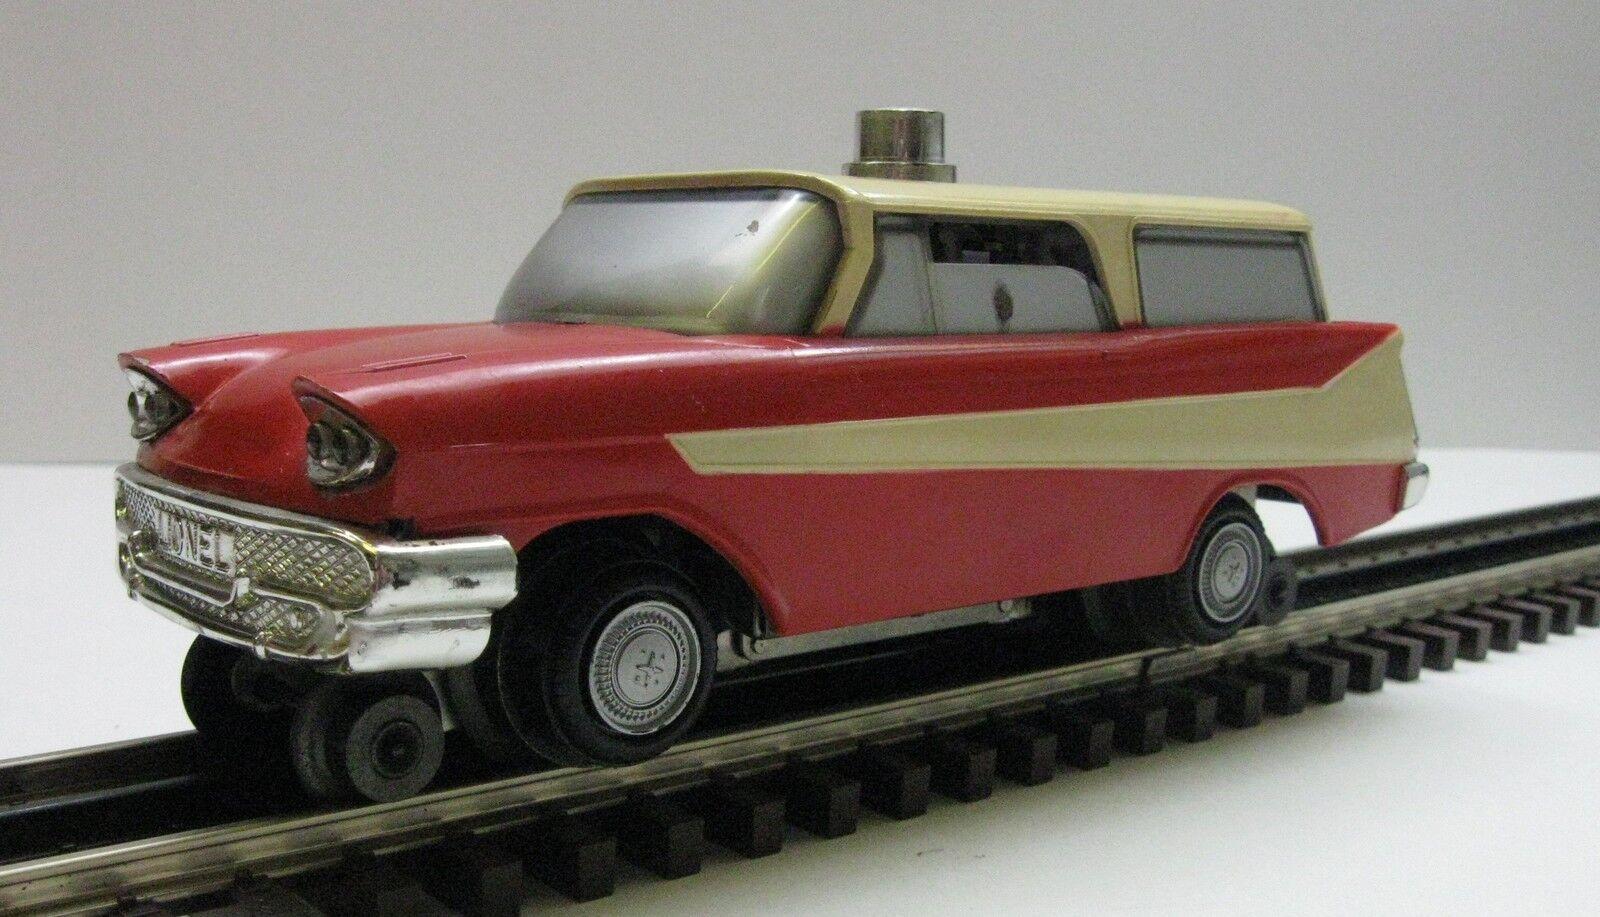 Lionel 68 O Gauge Executive Inspection Car